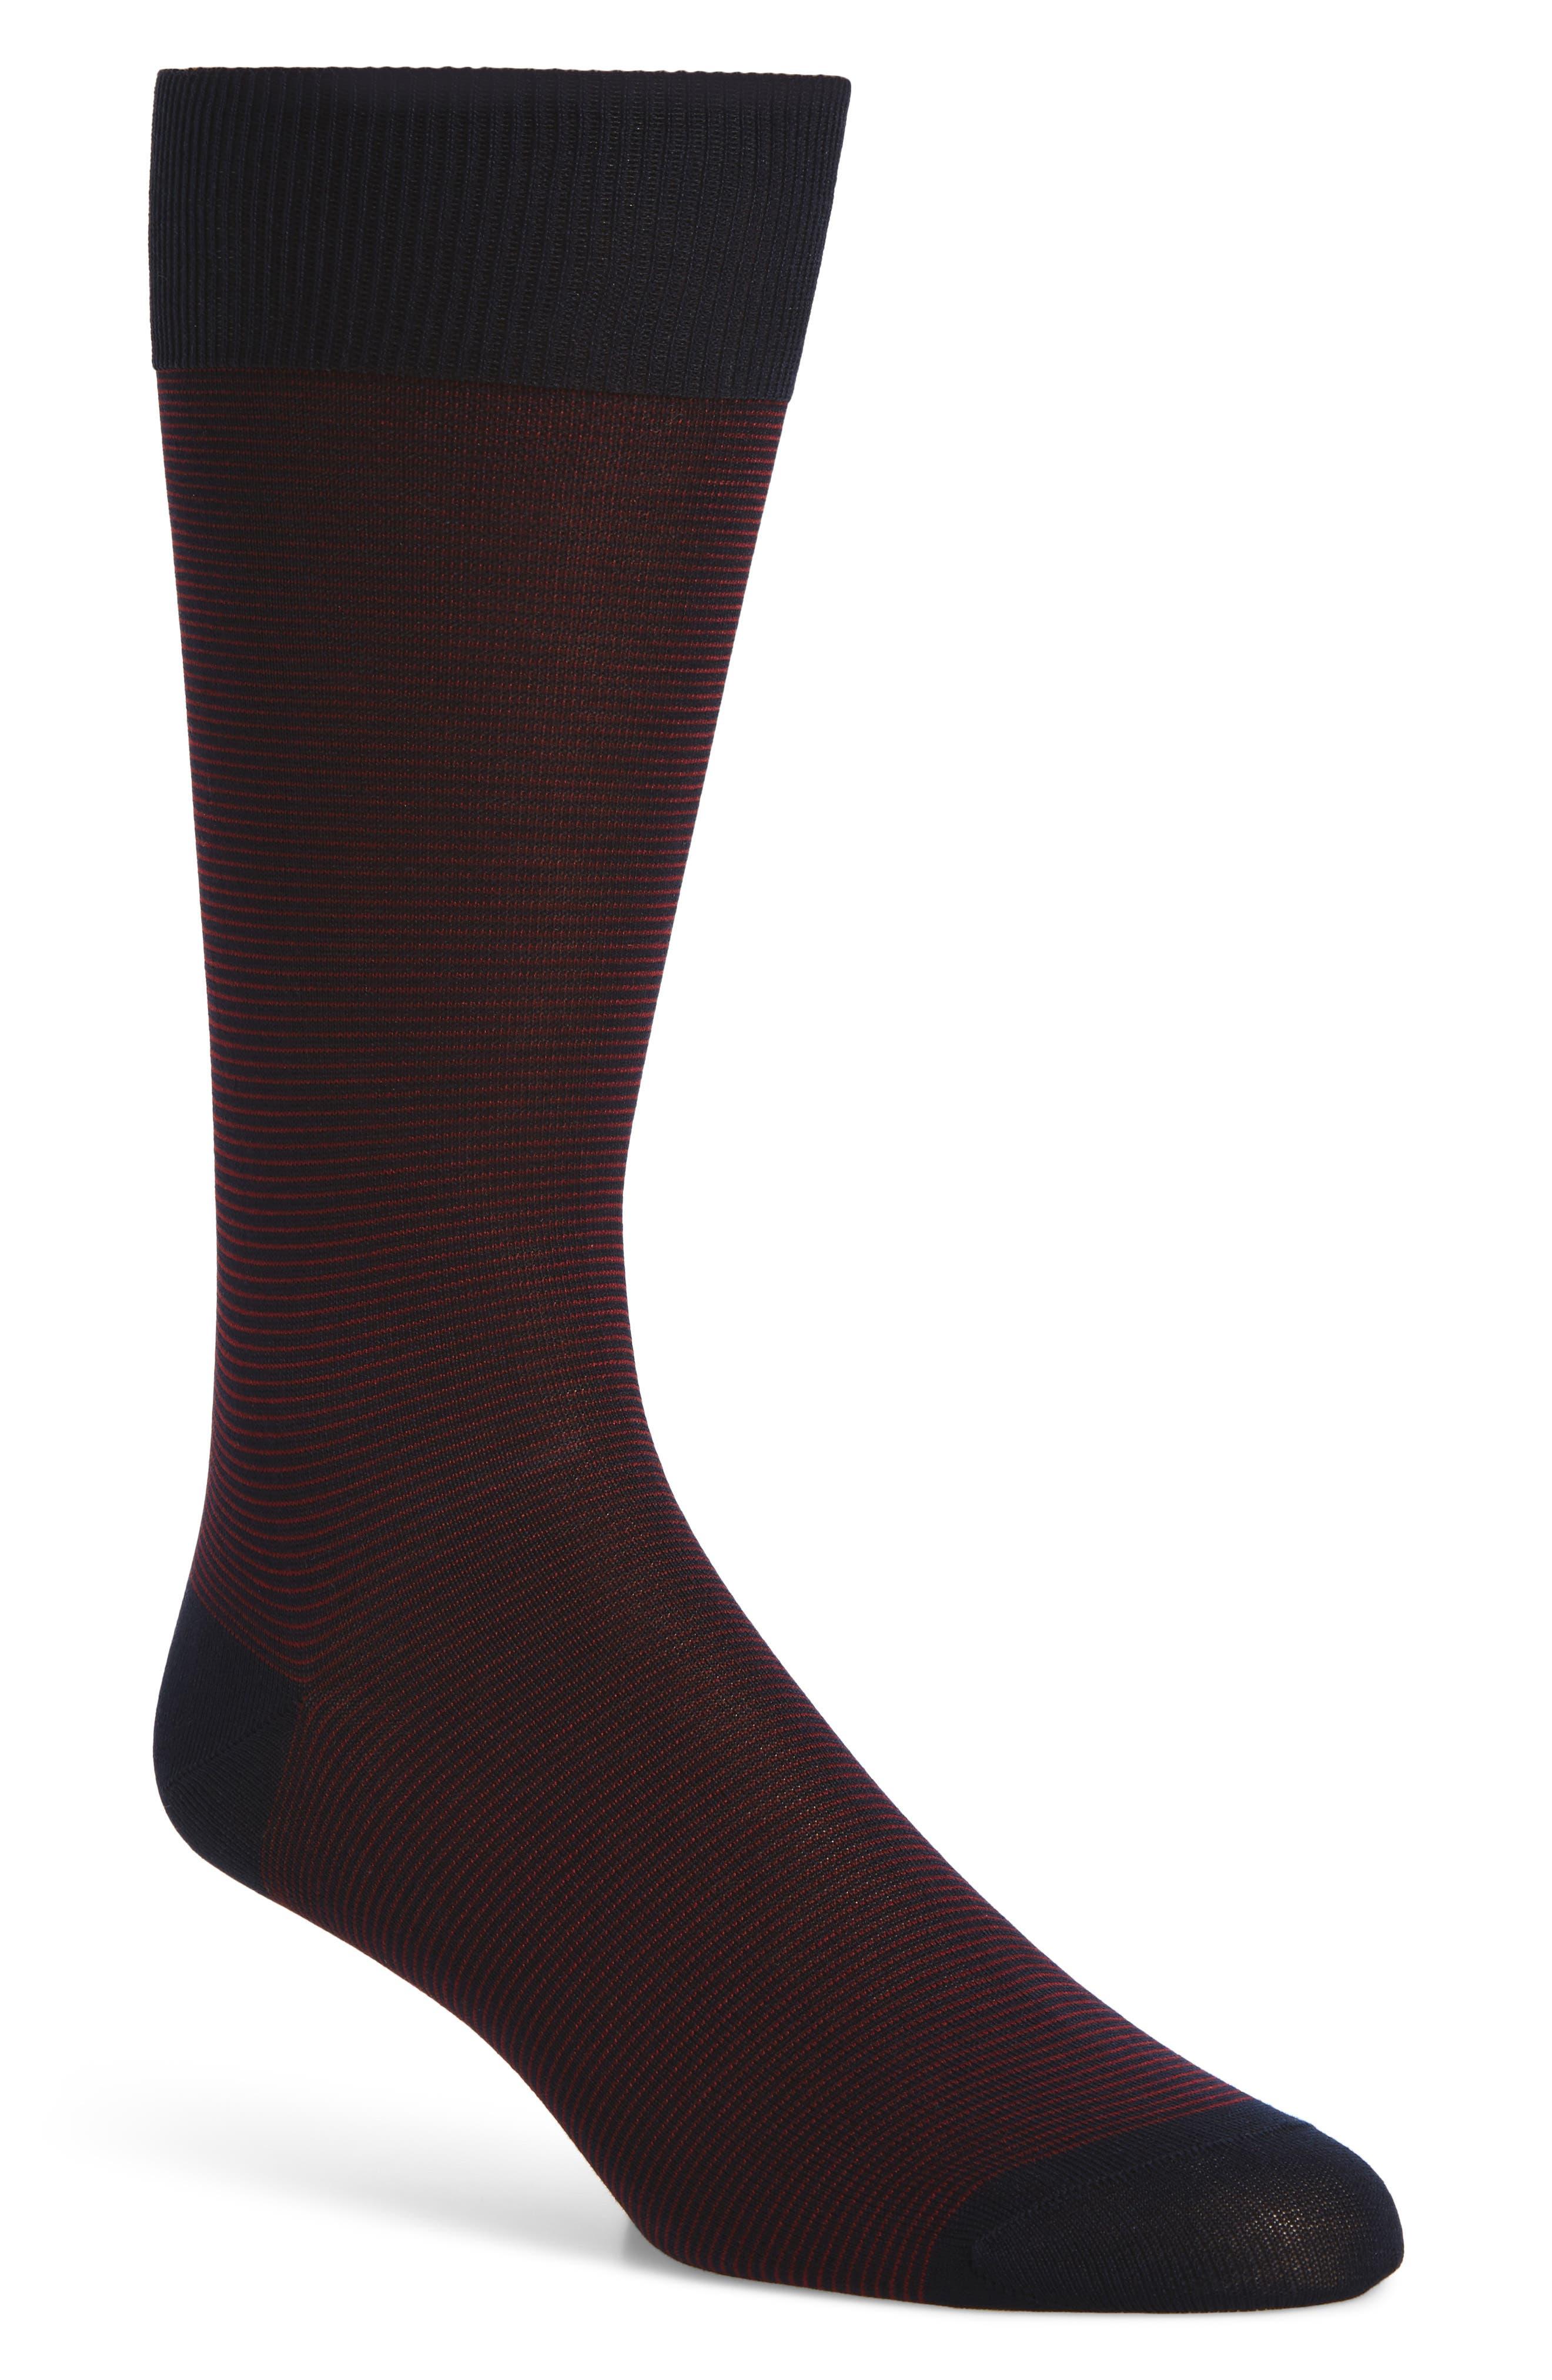 Pantherella Microstripe Socks